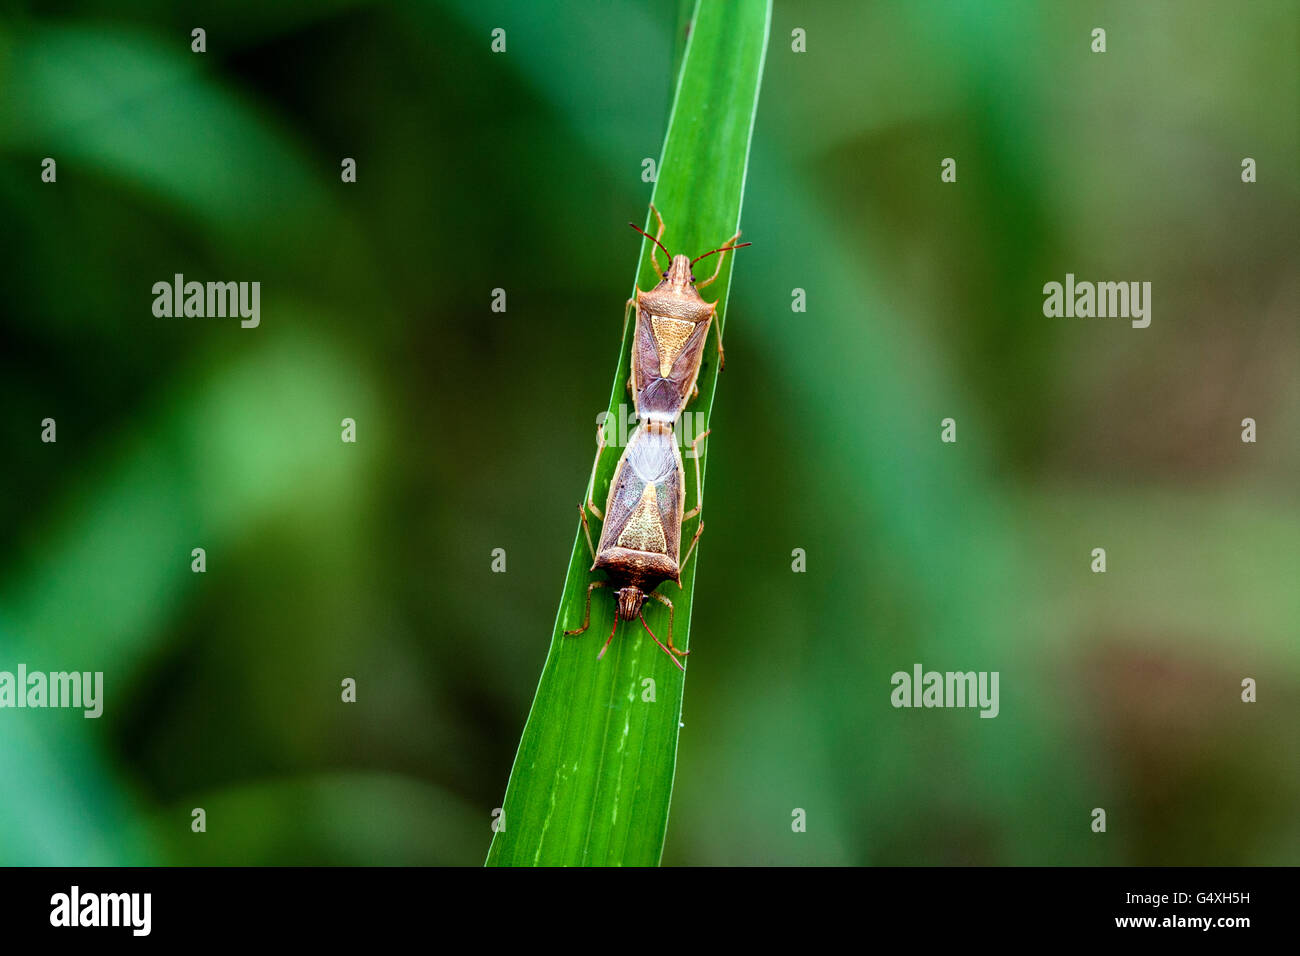 Stink Bug Species Mating - Camp Lula Sams, Brownsville, Texas, USA - Stock Image